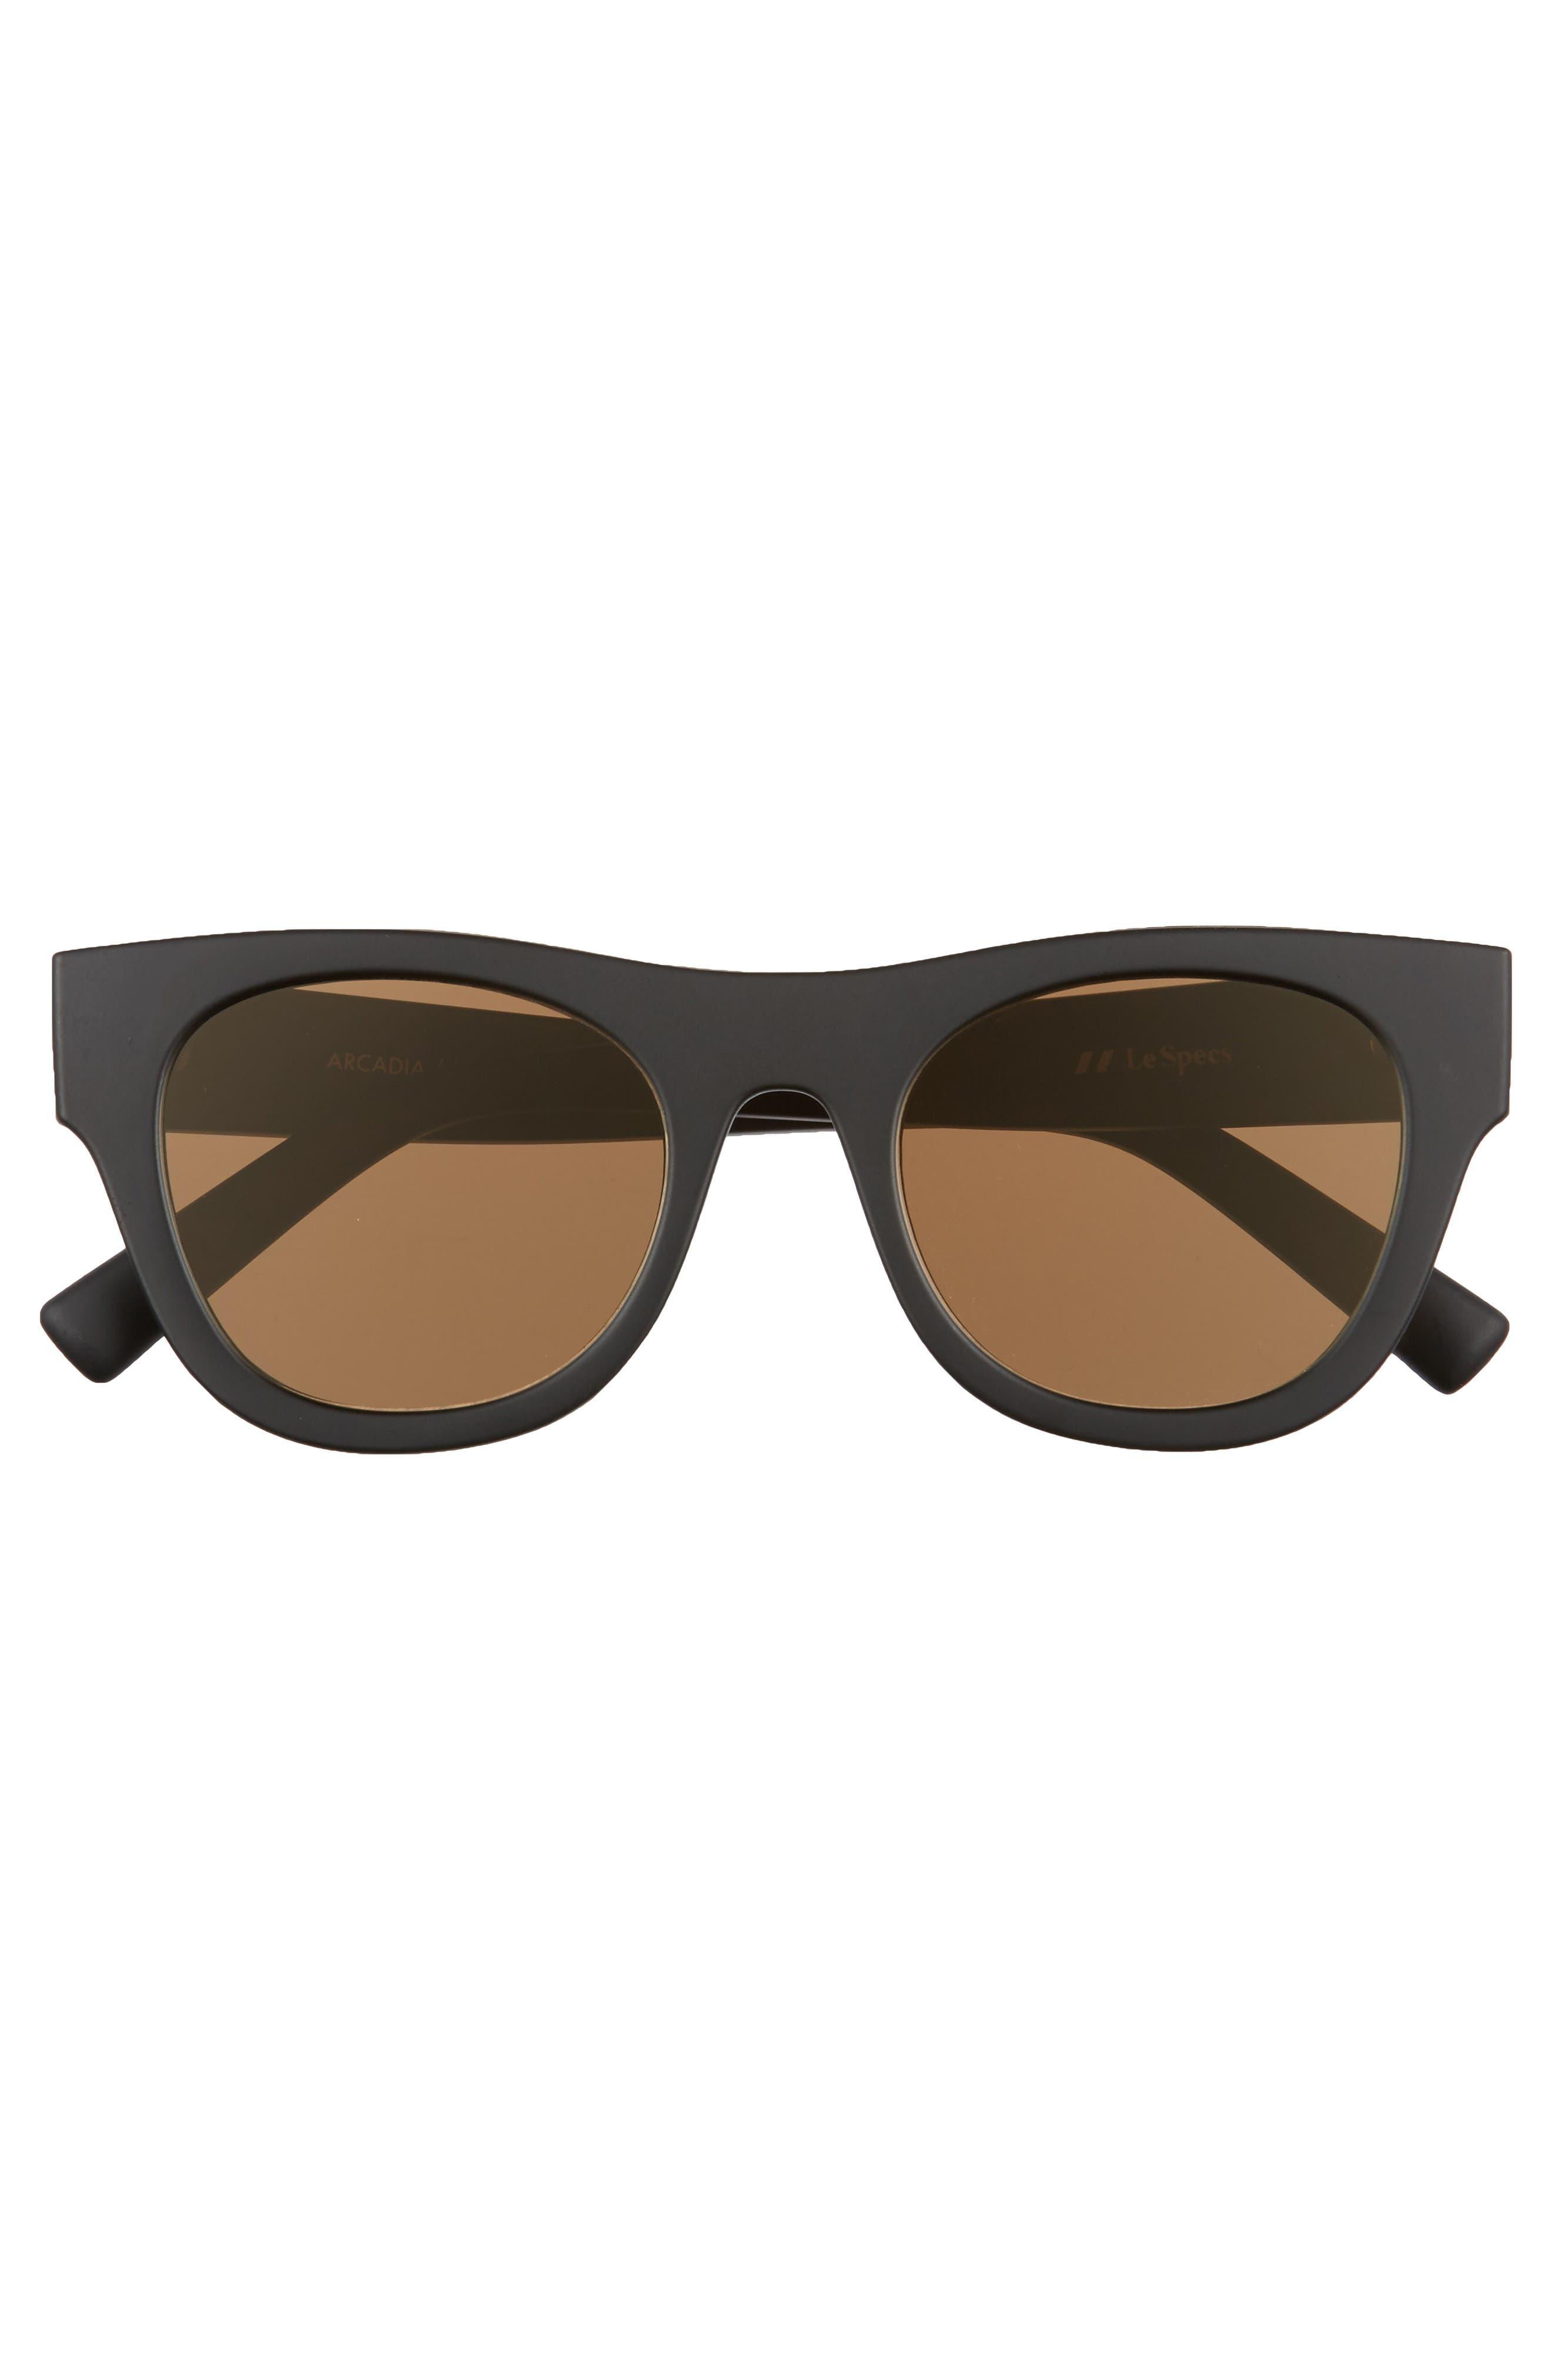 Arcadia 49mm Sunglasses,                             Alternate thumbnail 6, color,